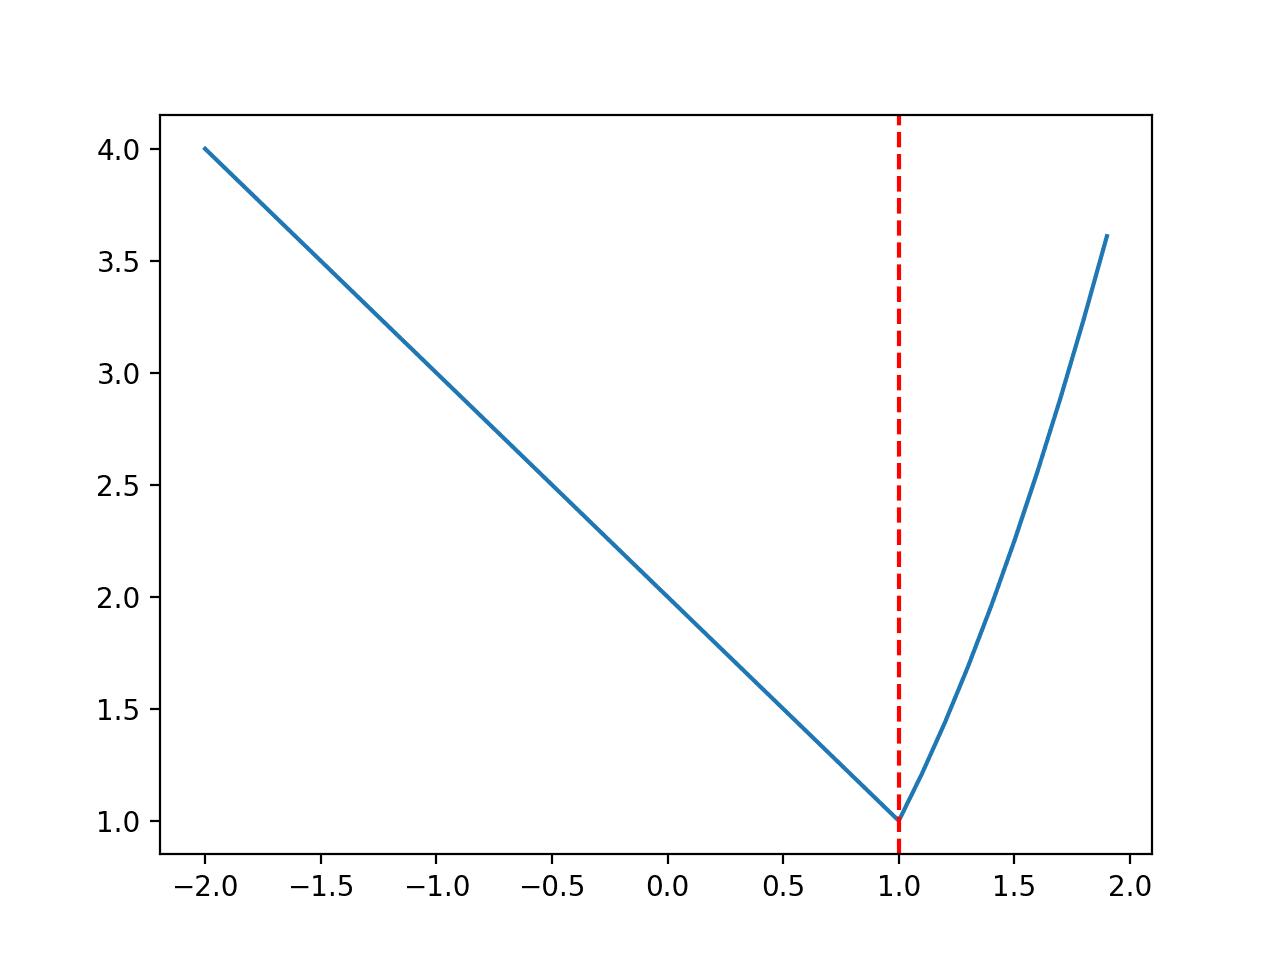 Line Plot of Discontinuous Optimization Function